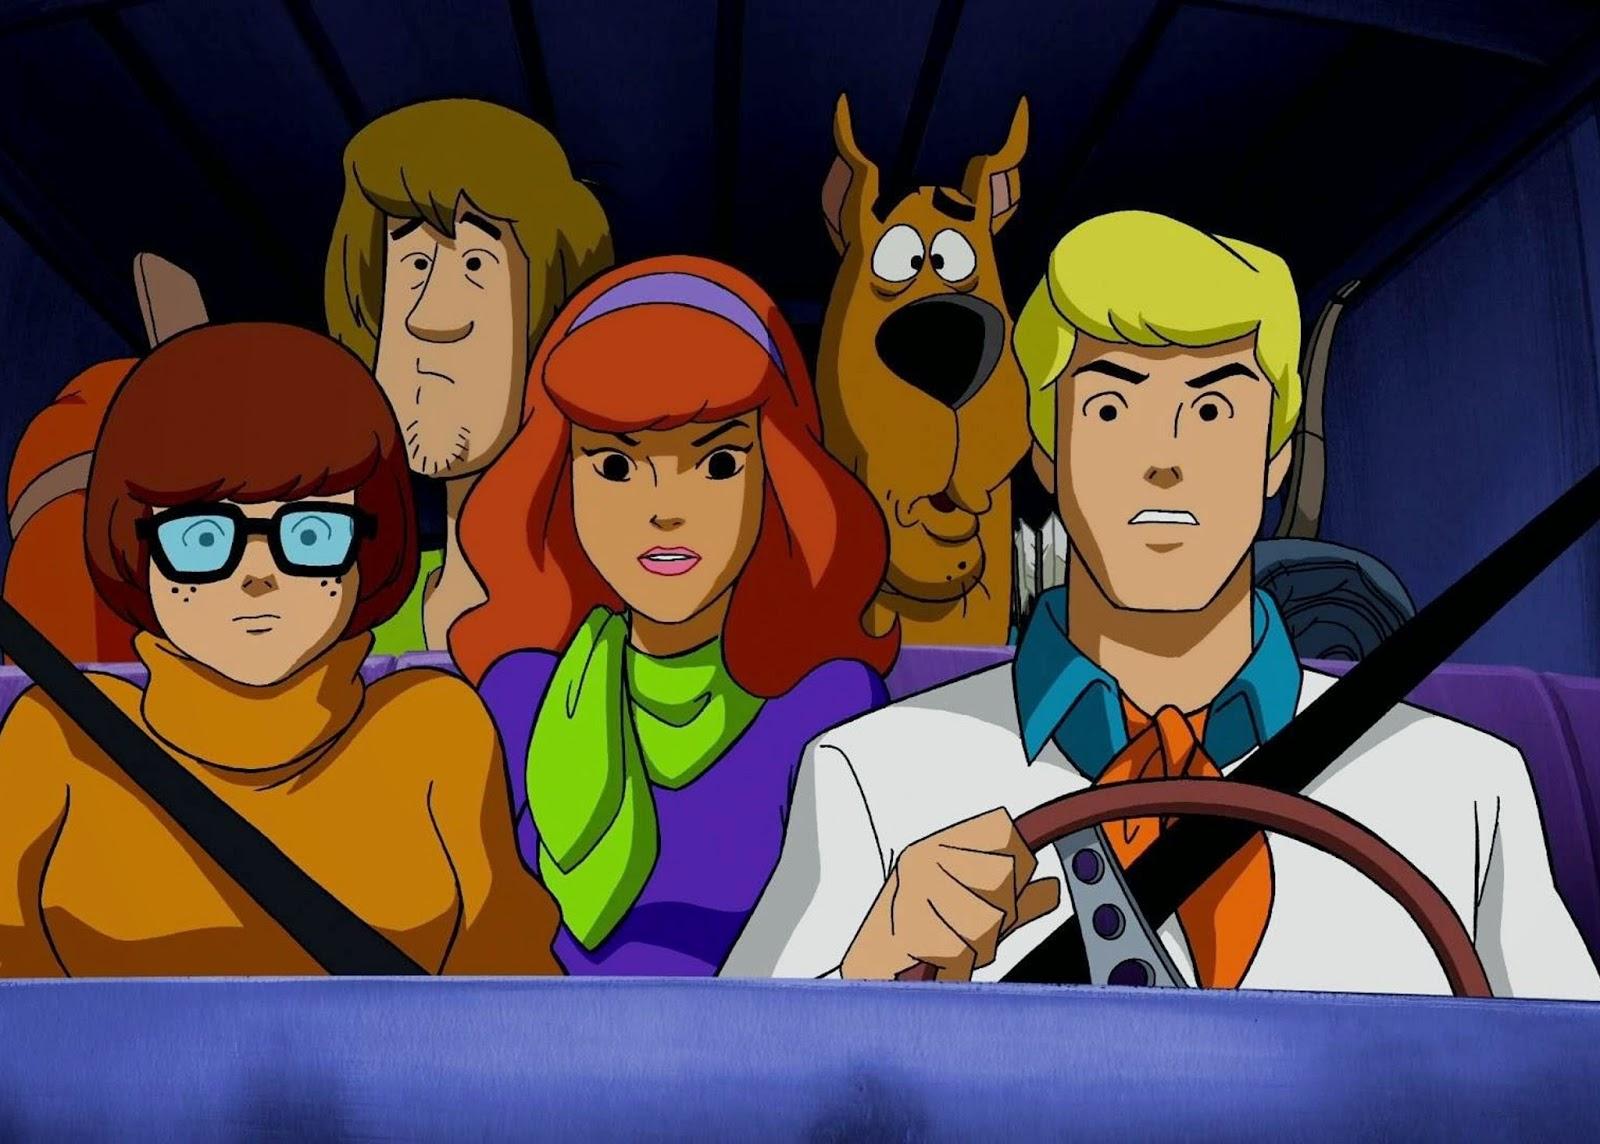 Disney HD Wallpapers: Scooby Doo HD Wallpapers